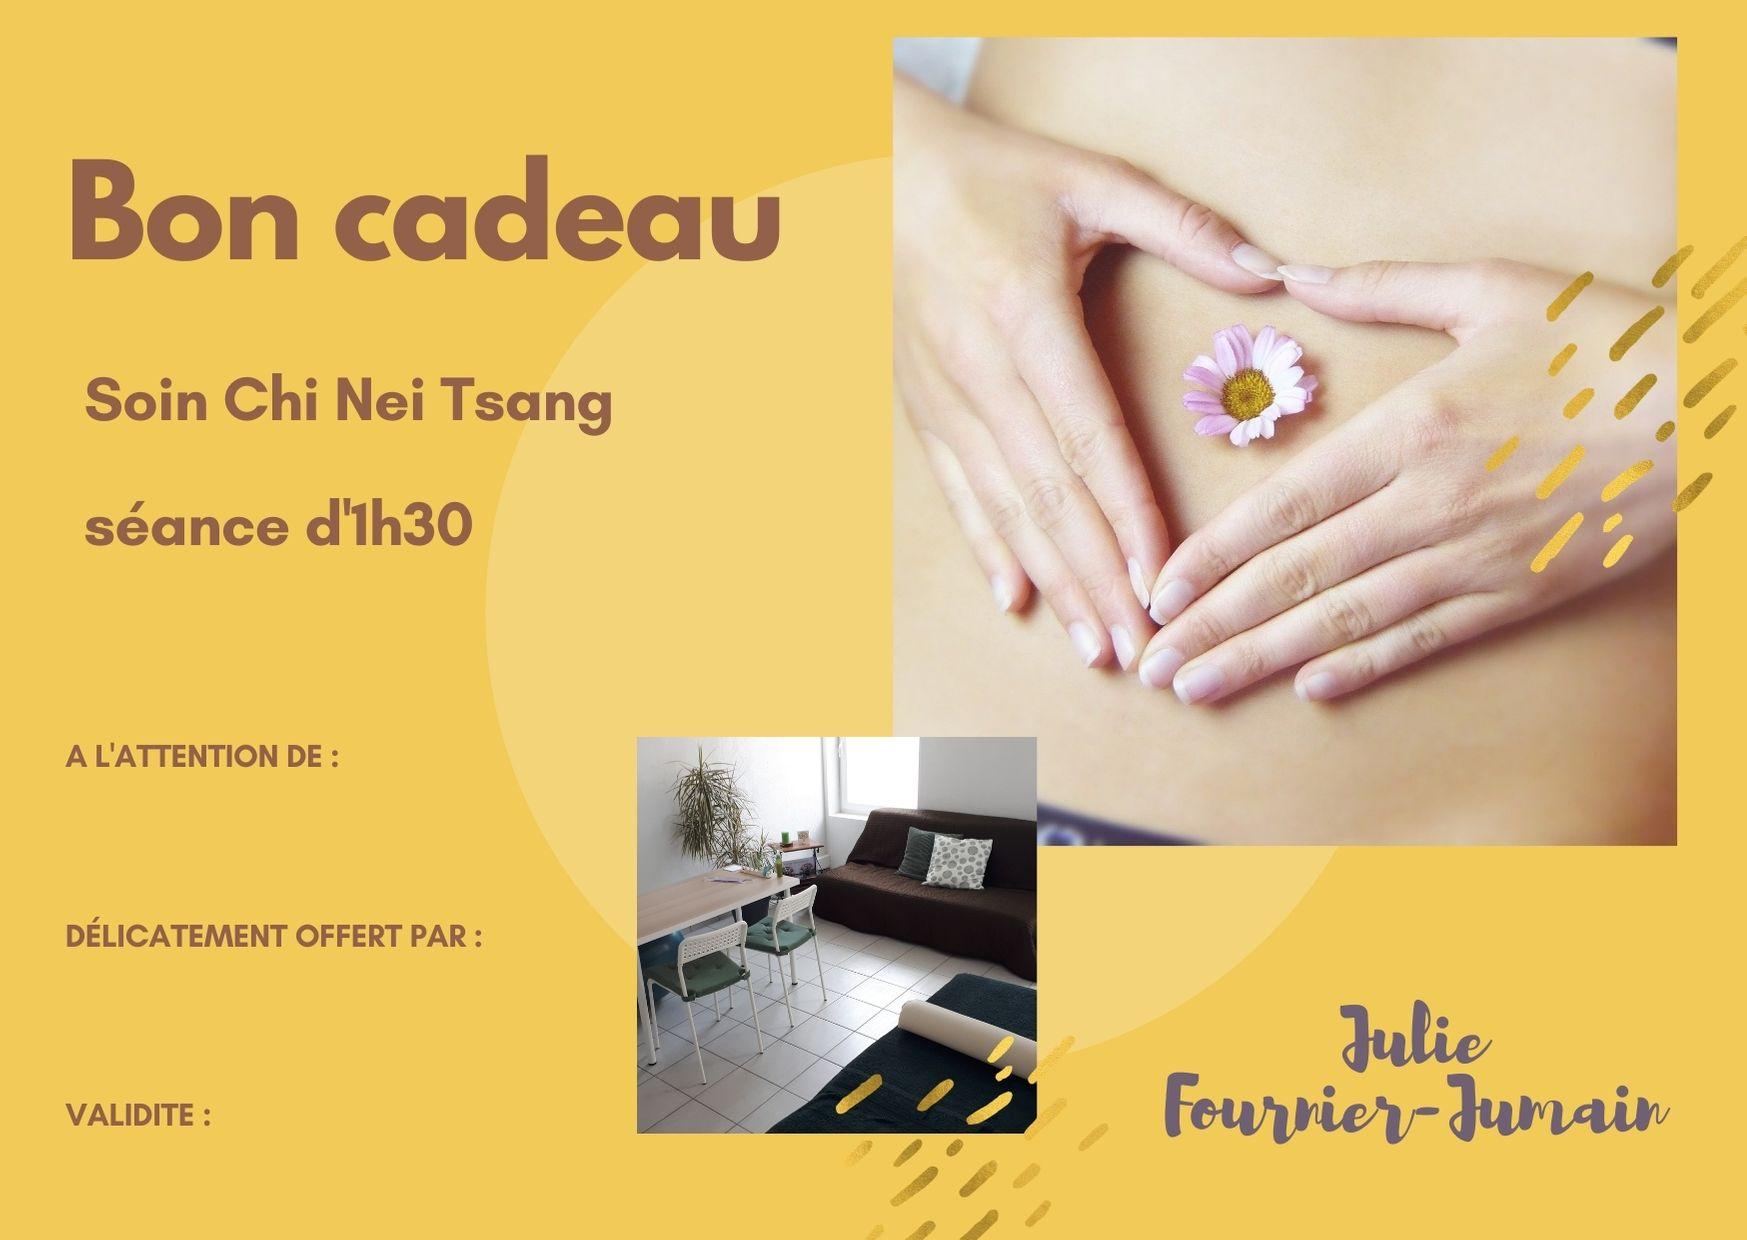 Bon cadeau massage Chi Nei Tsang